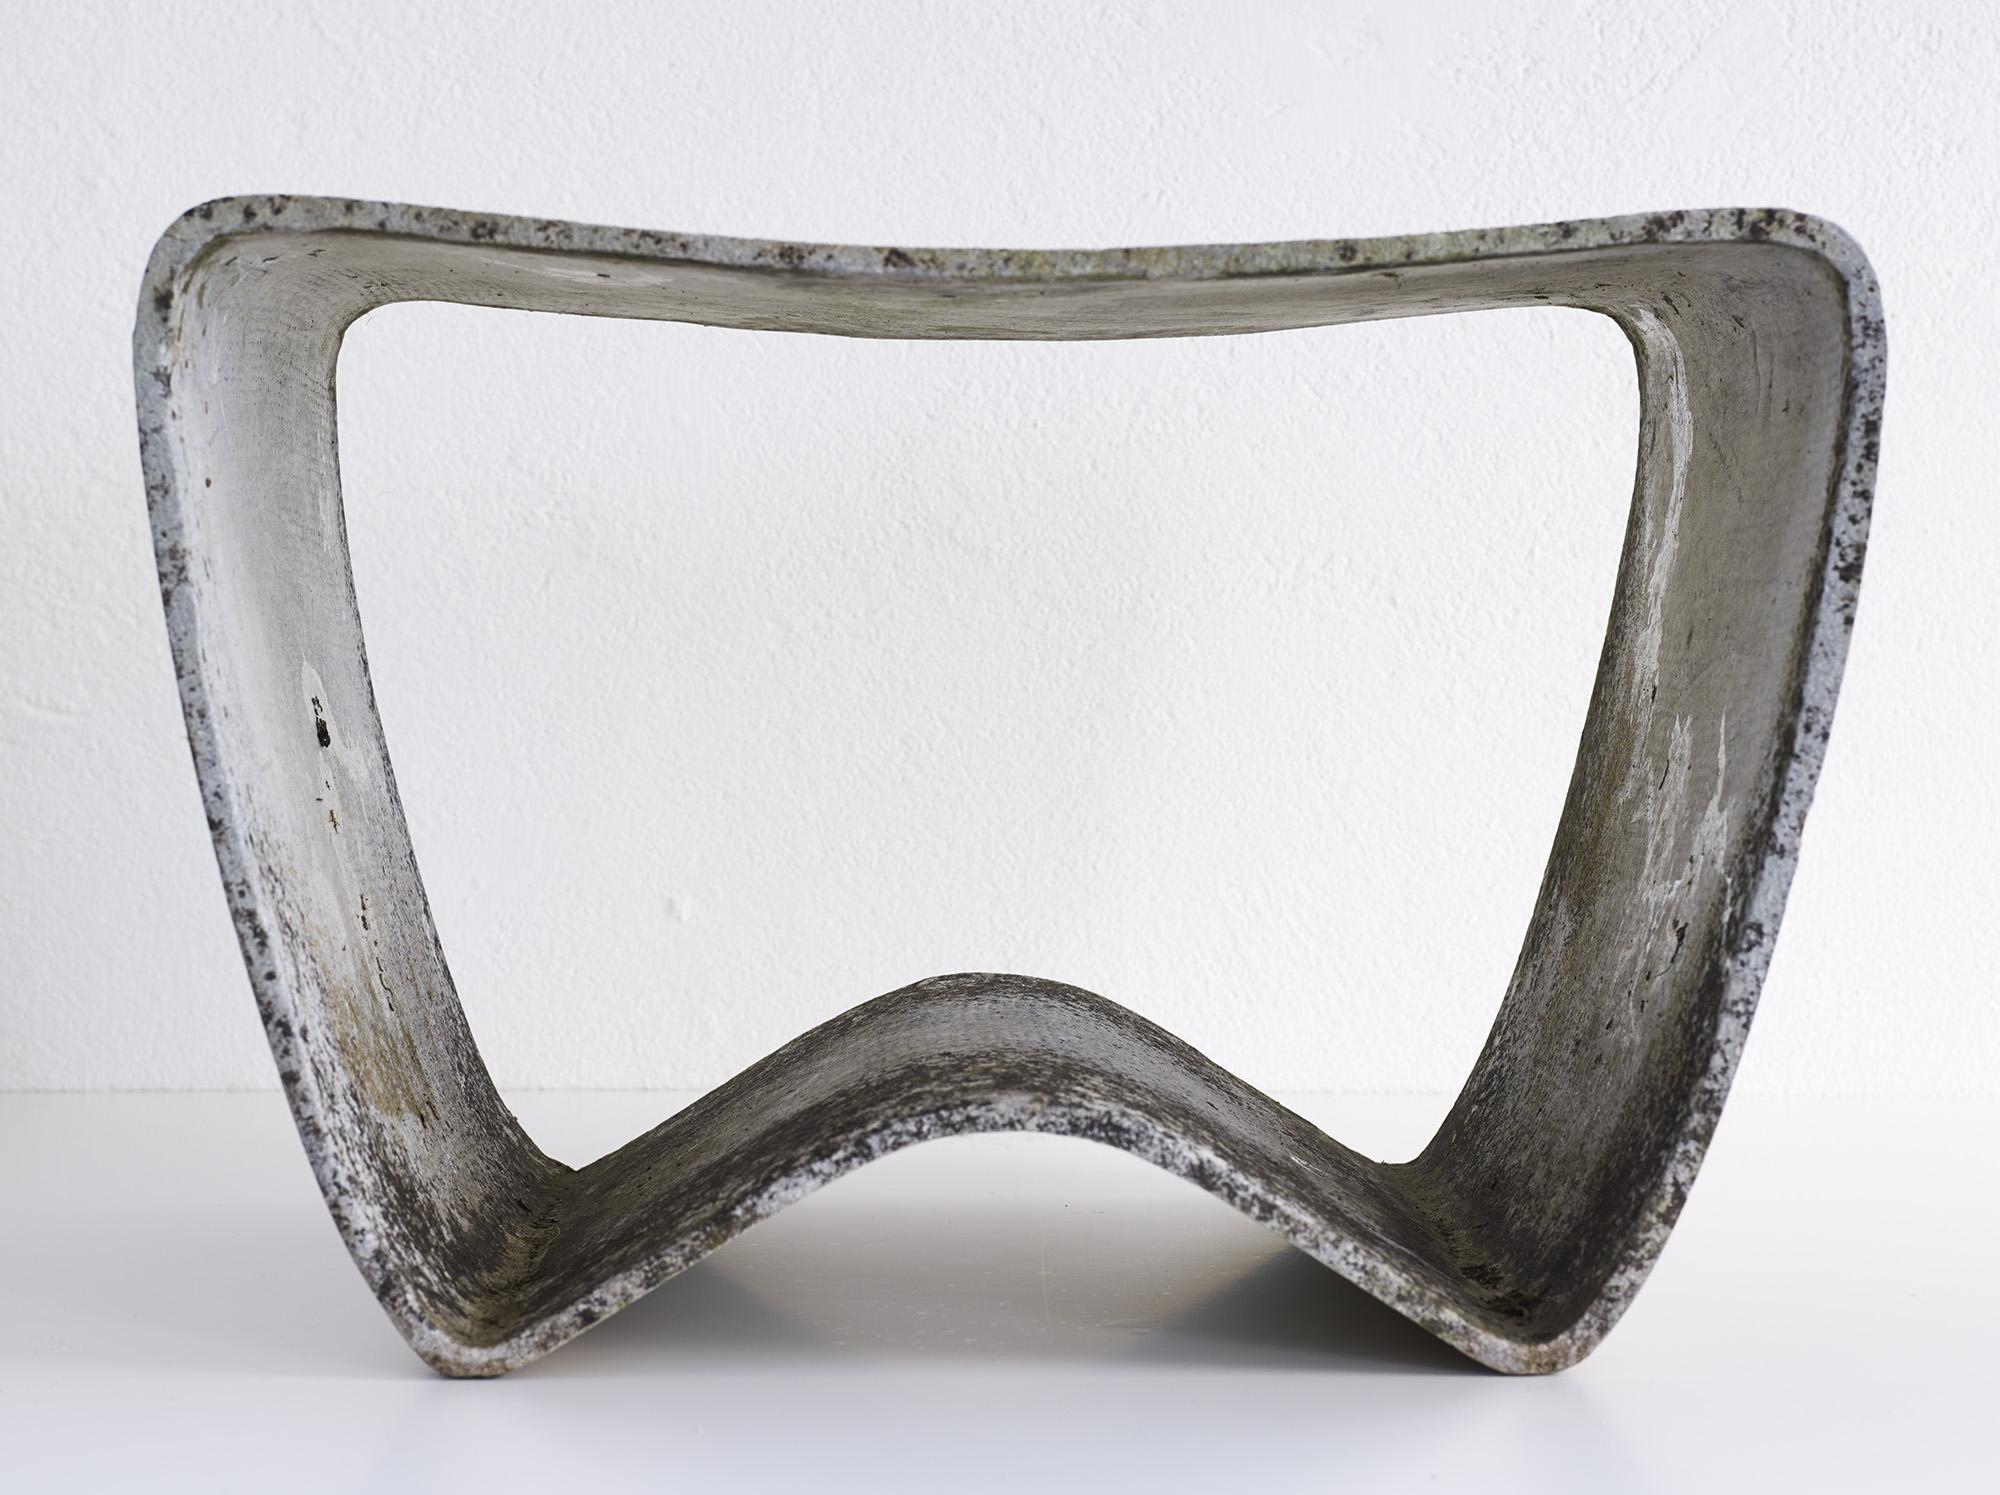 rare-stool-g59-11-by-ludwig-walser-image-04